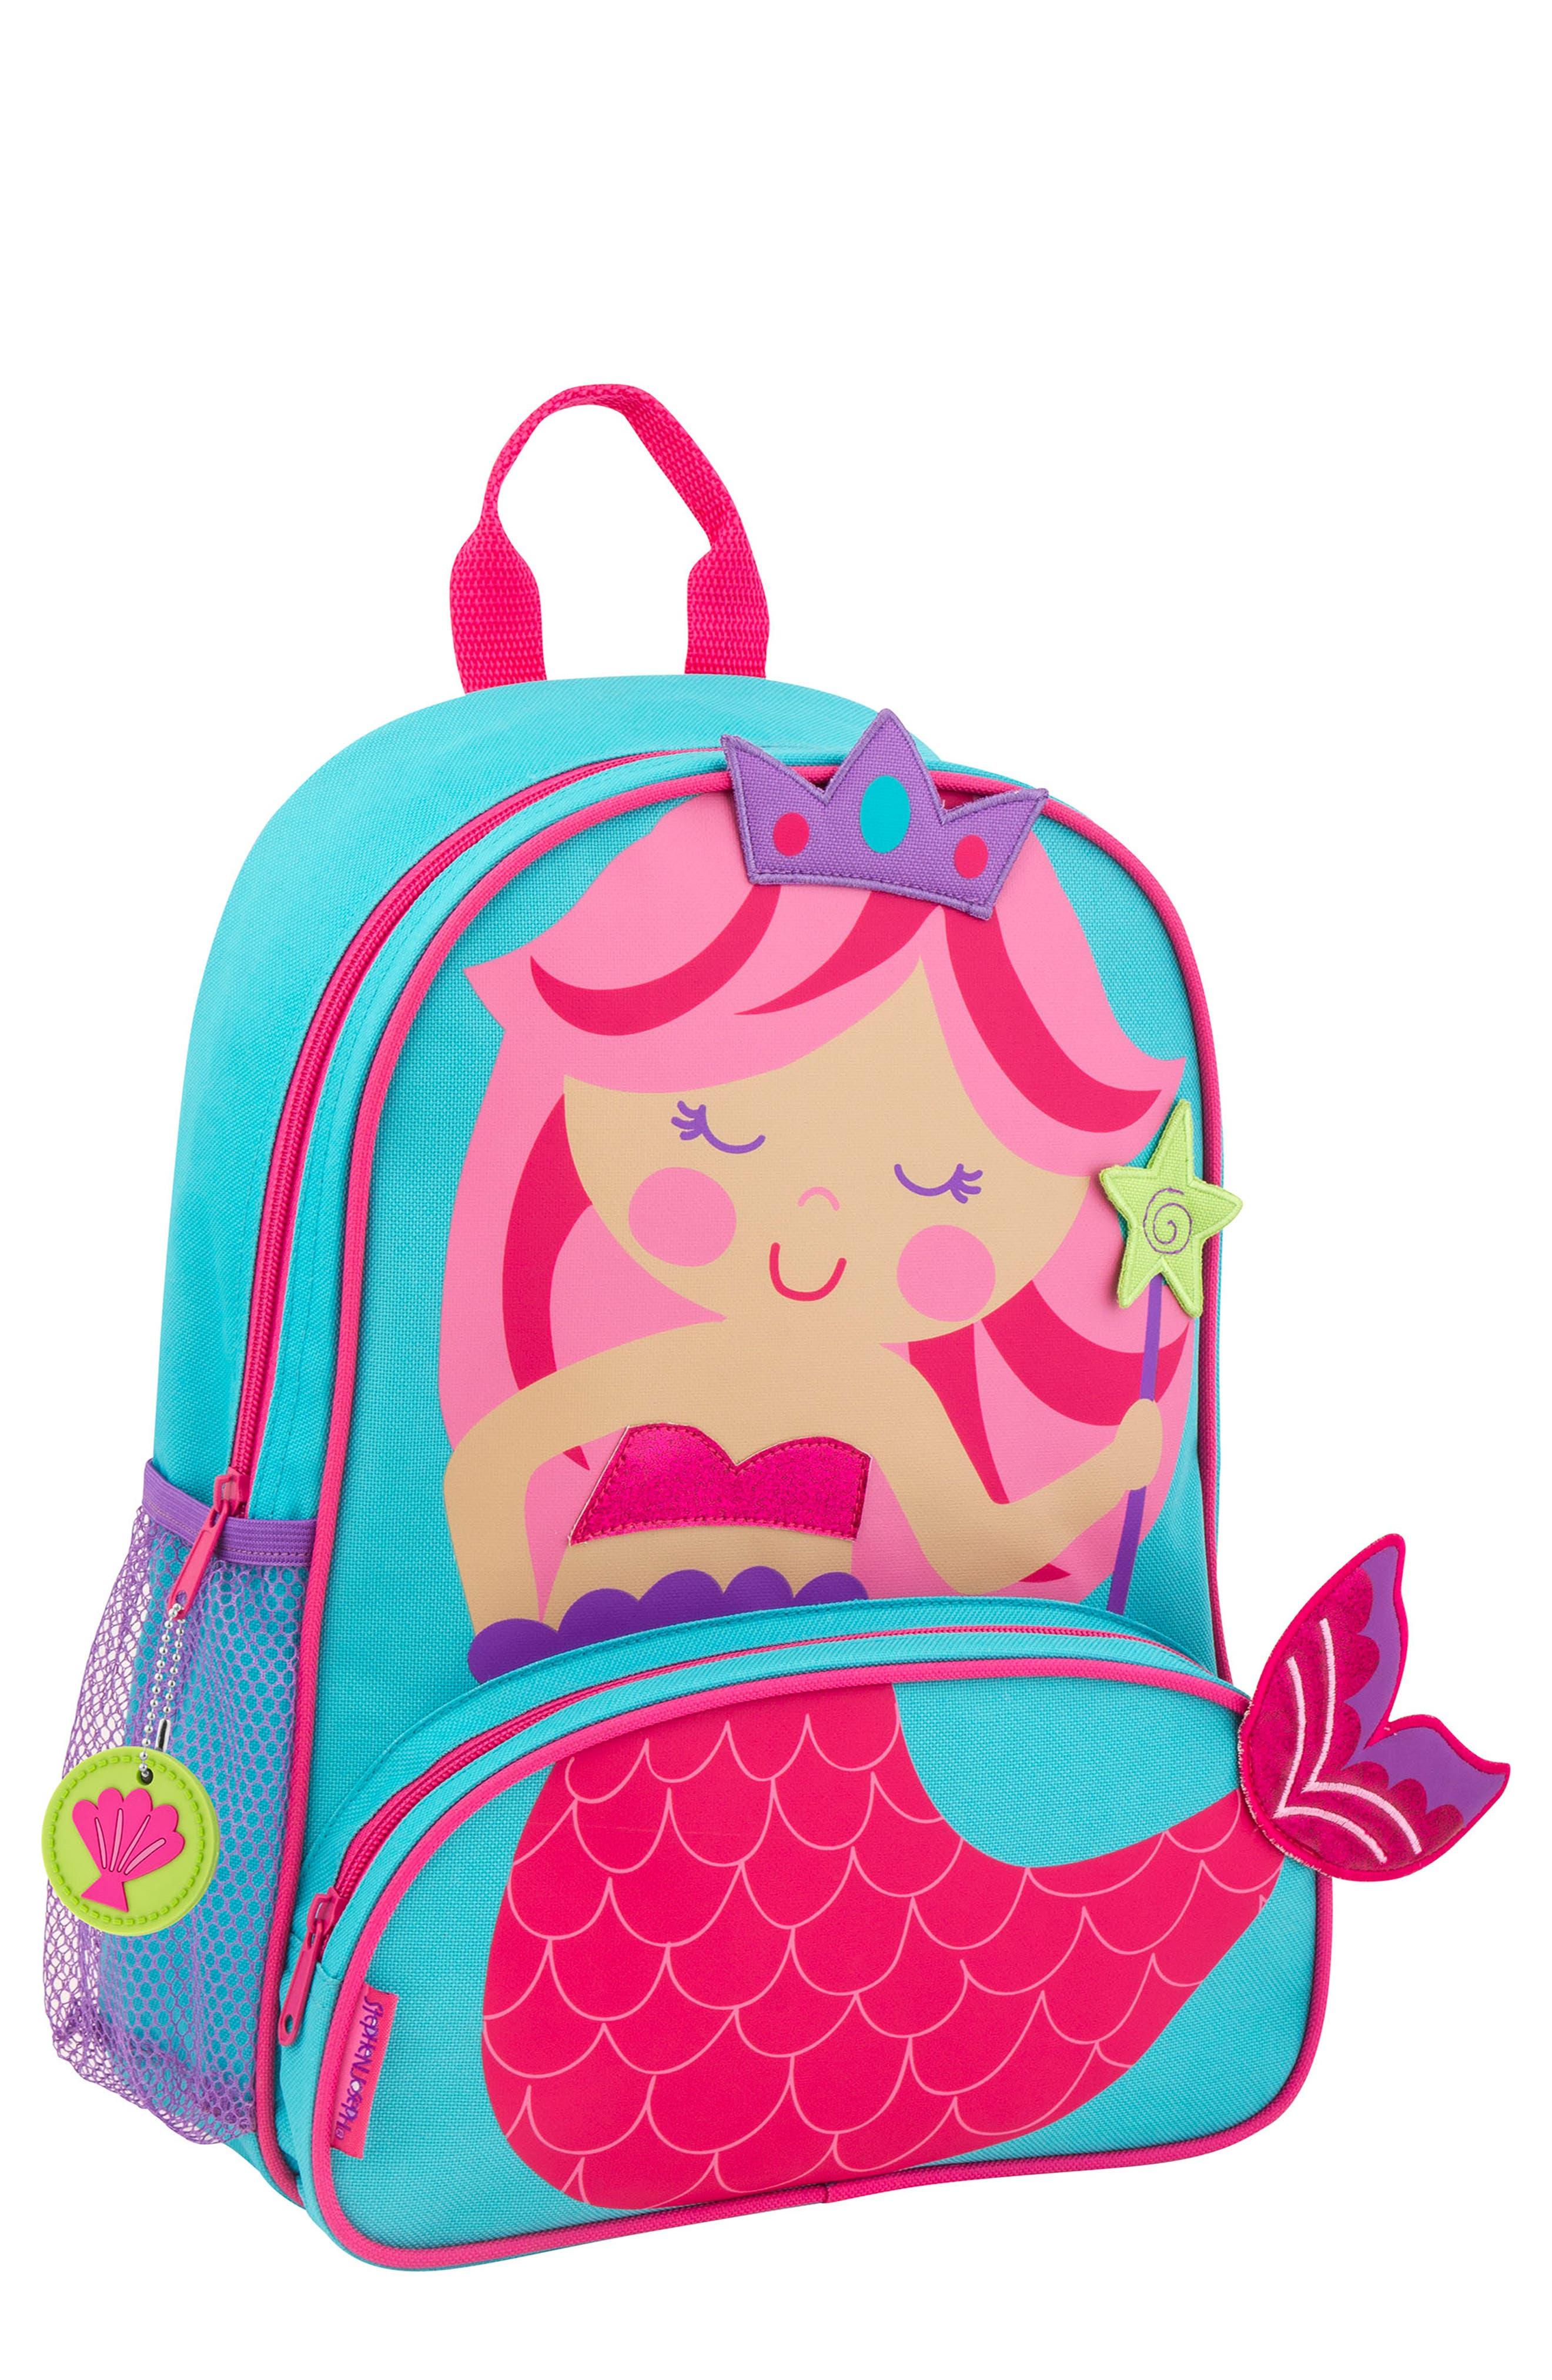 Girls Stephen Joseph Mermaid Sidekick Backpack  Lunch Pail